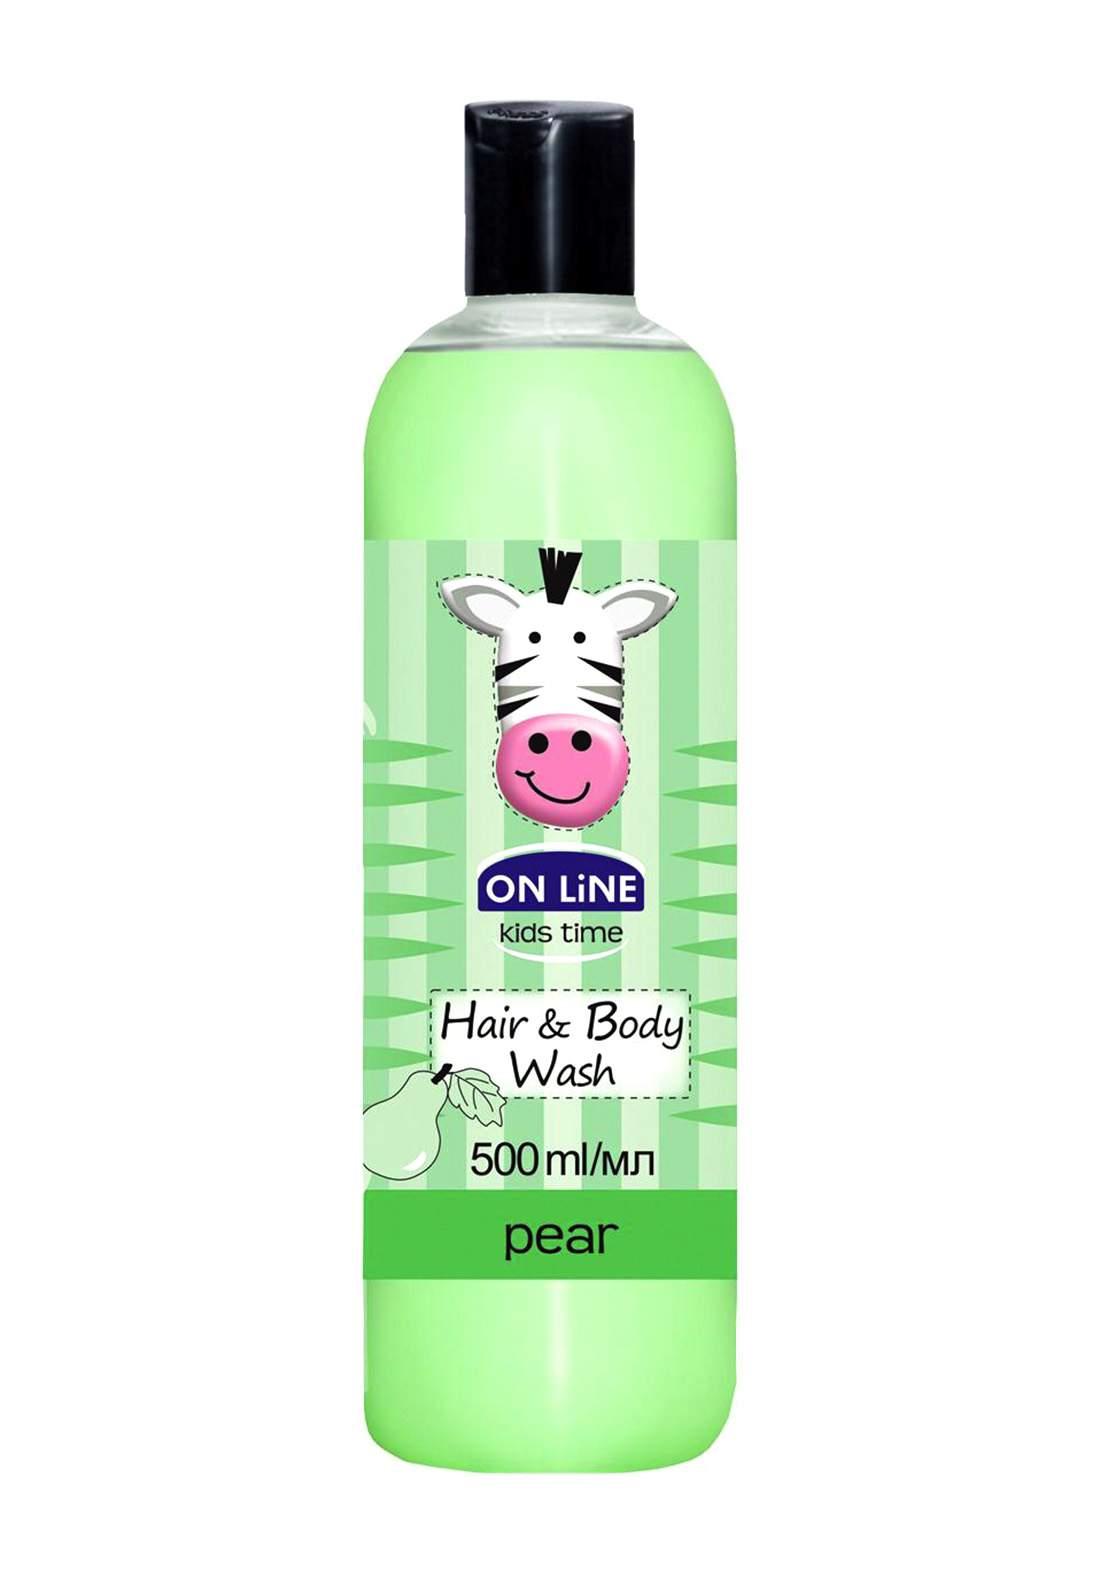 Online Pear Baby shampoo and shower gel 500 ml شامبو للاطفال